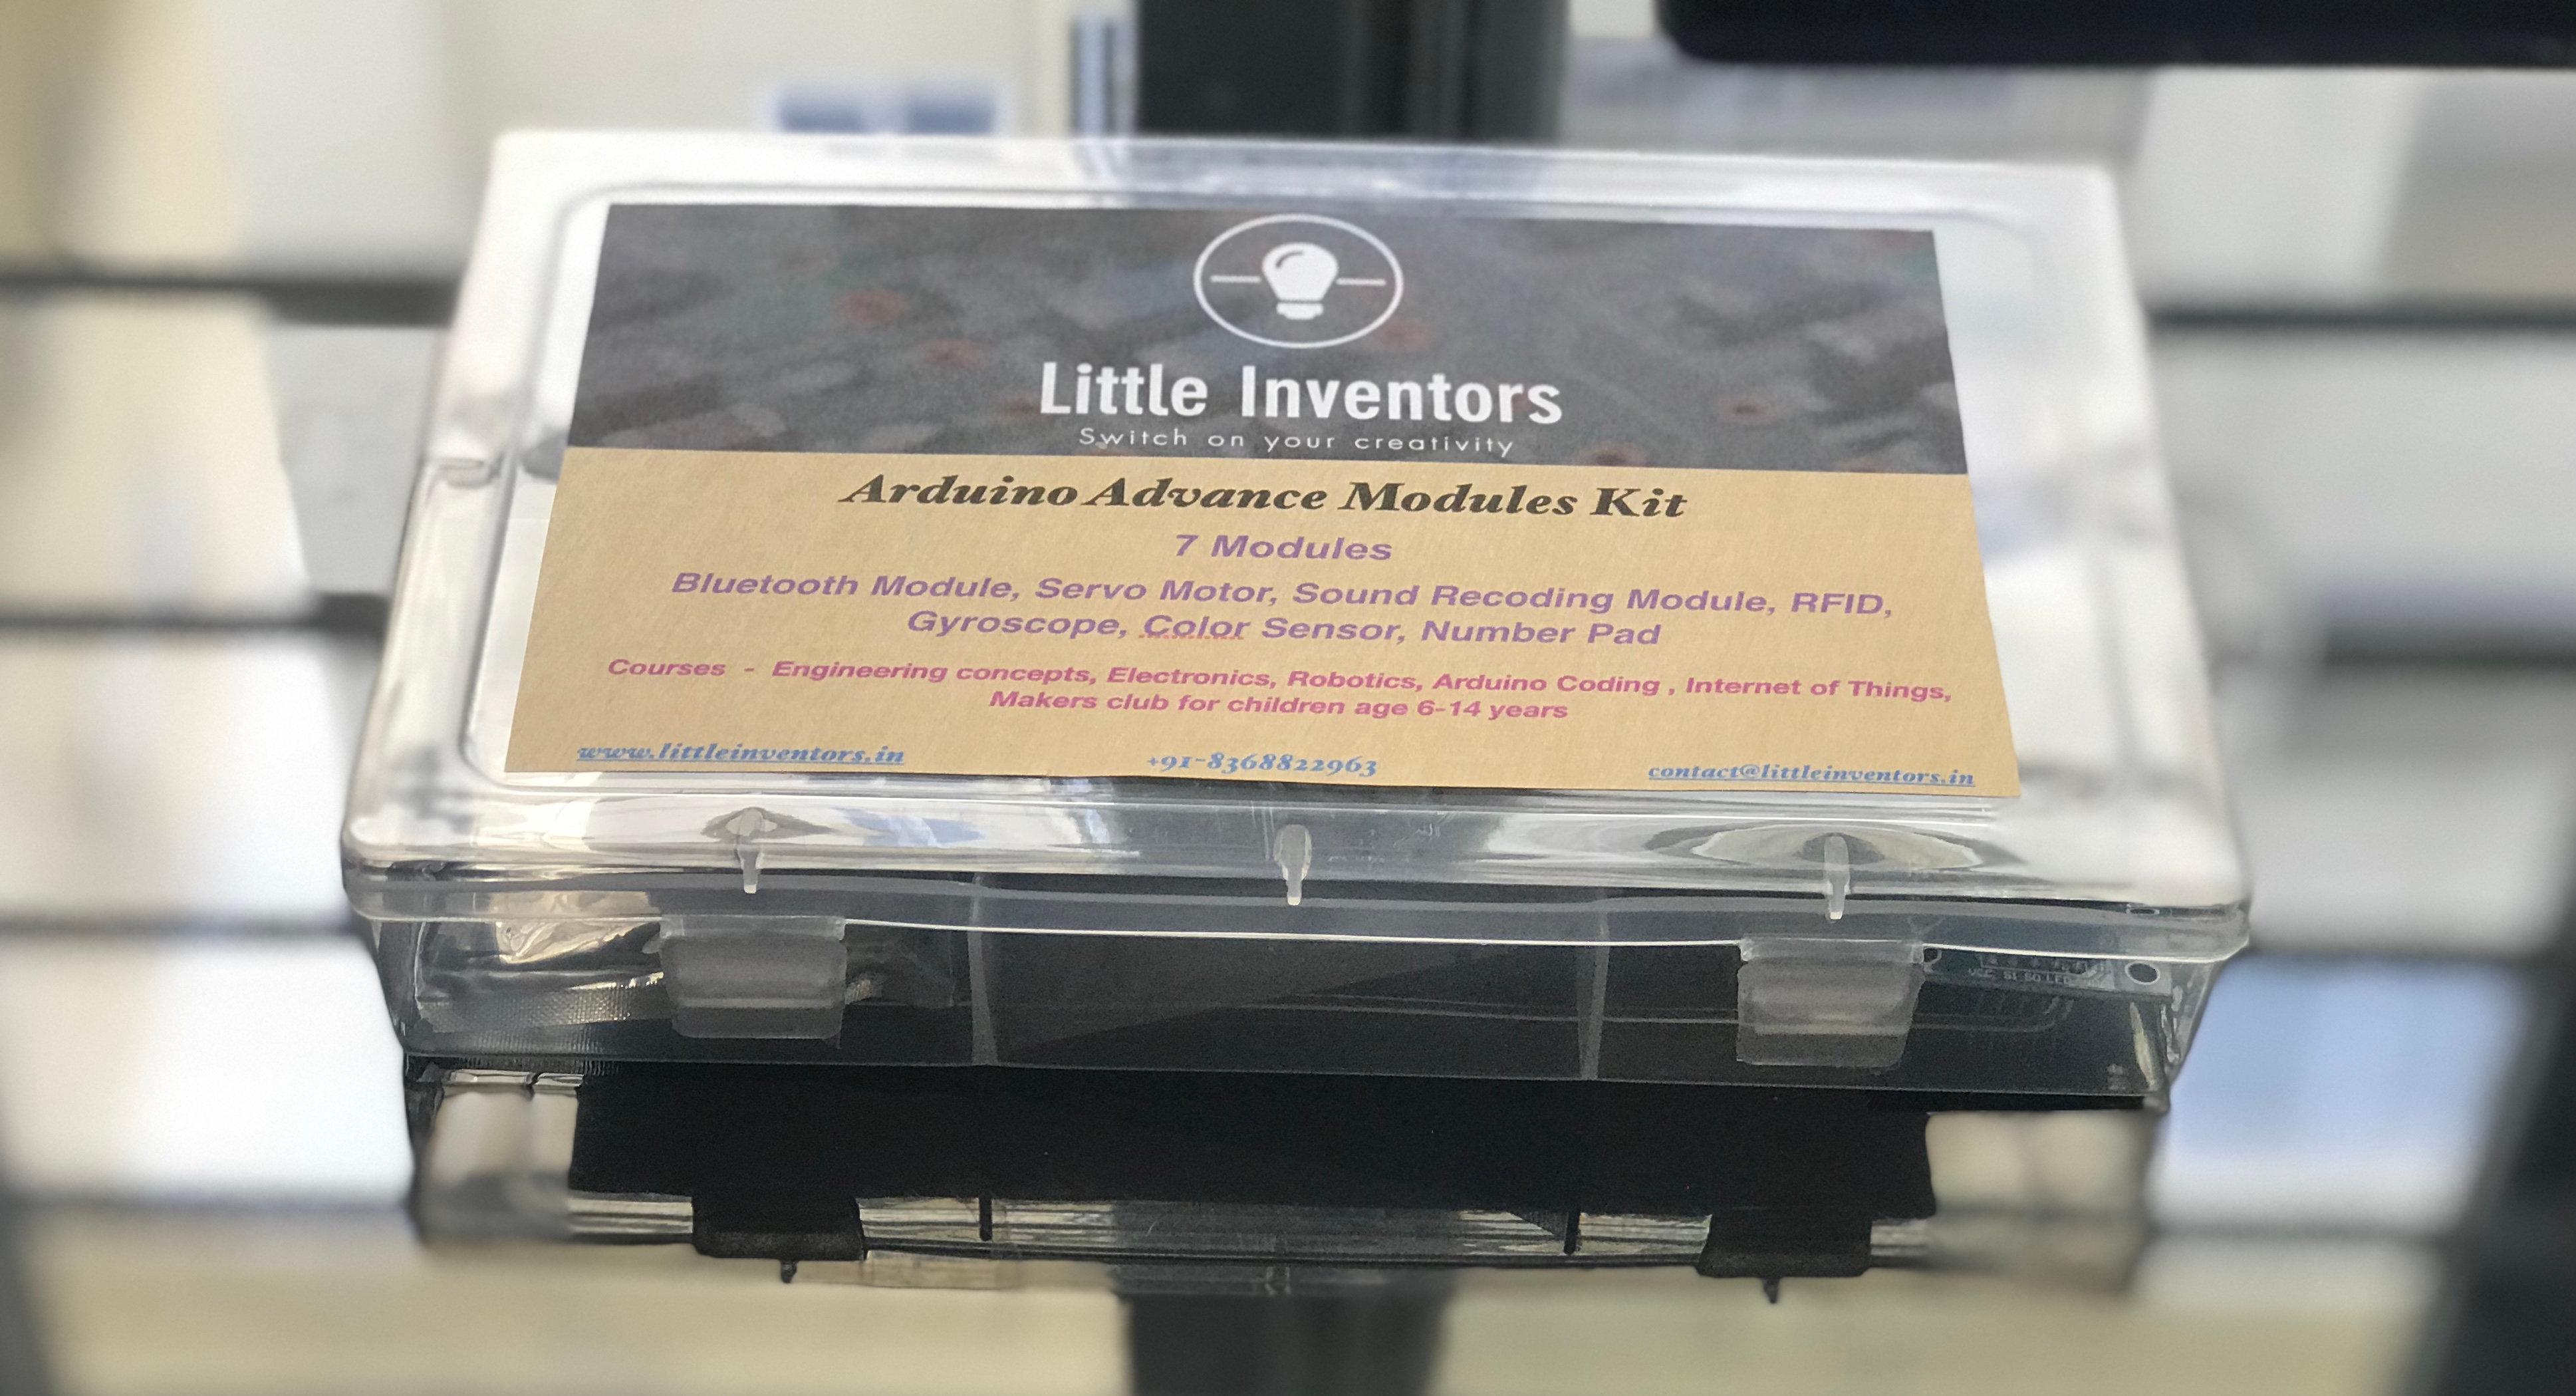 LittleInventors Advance Arduino Modules Kit | littleinventors